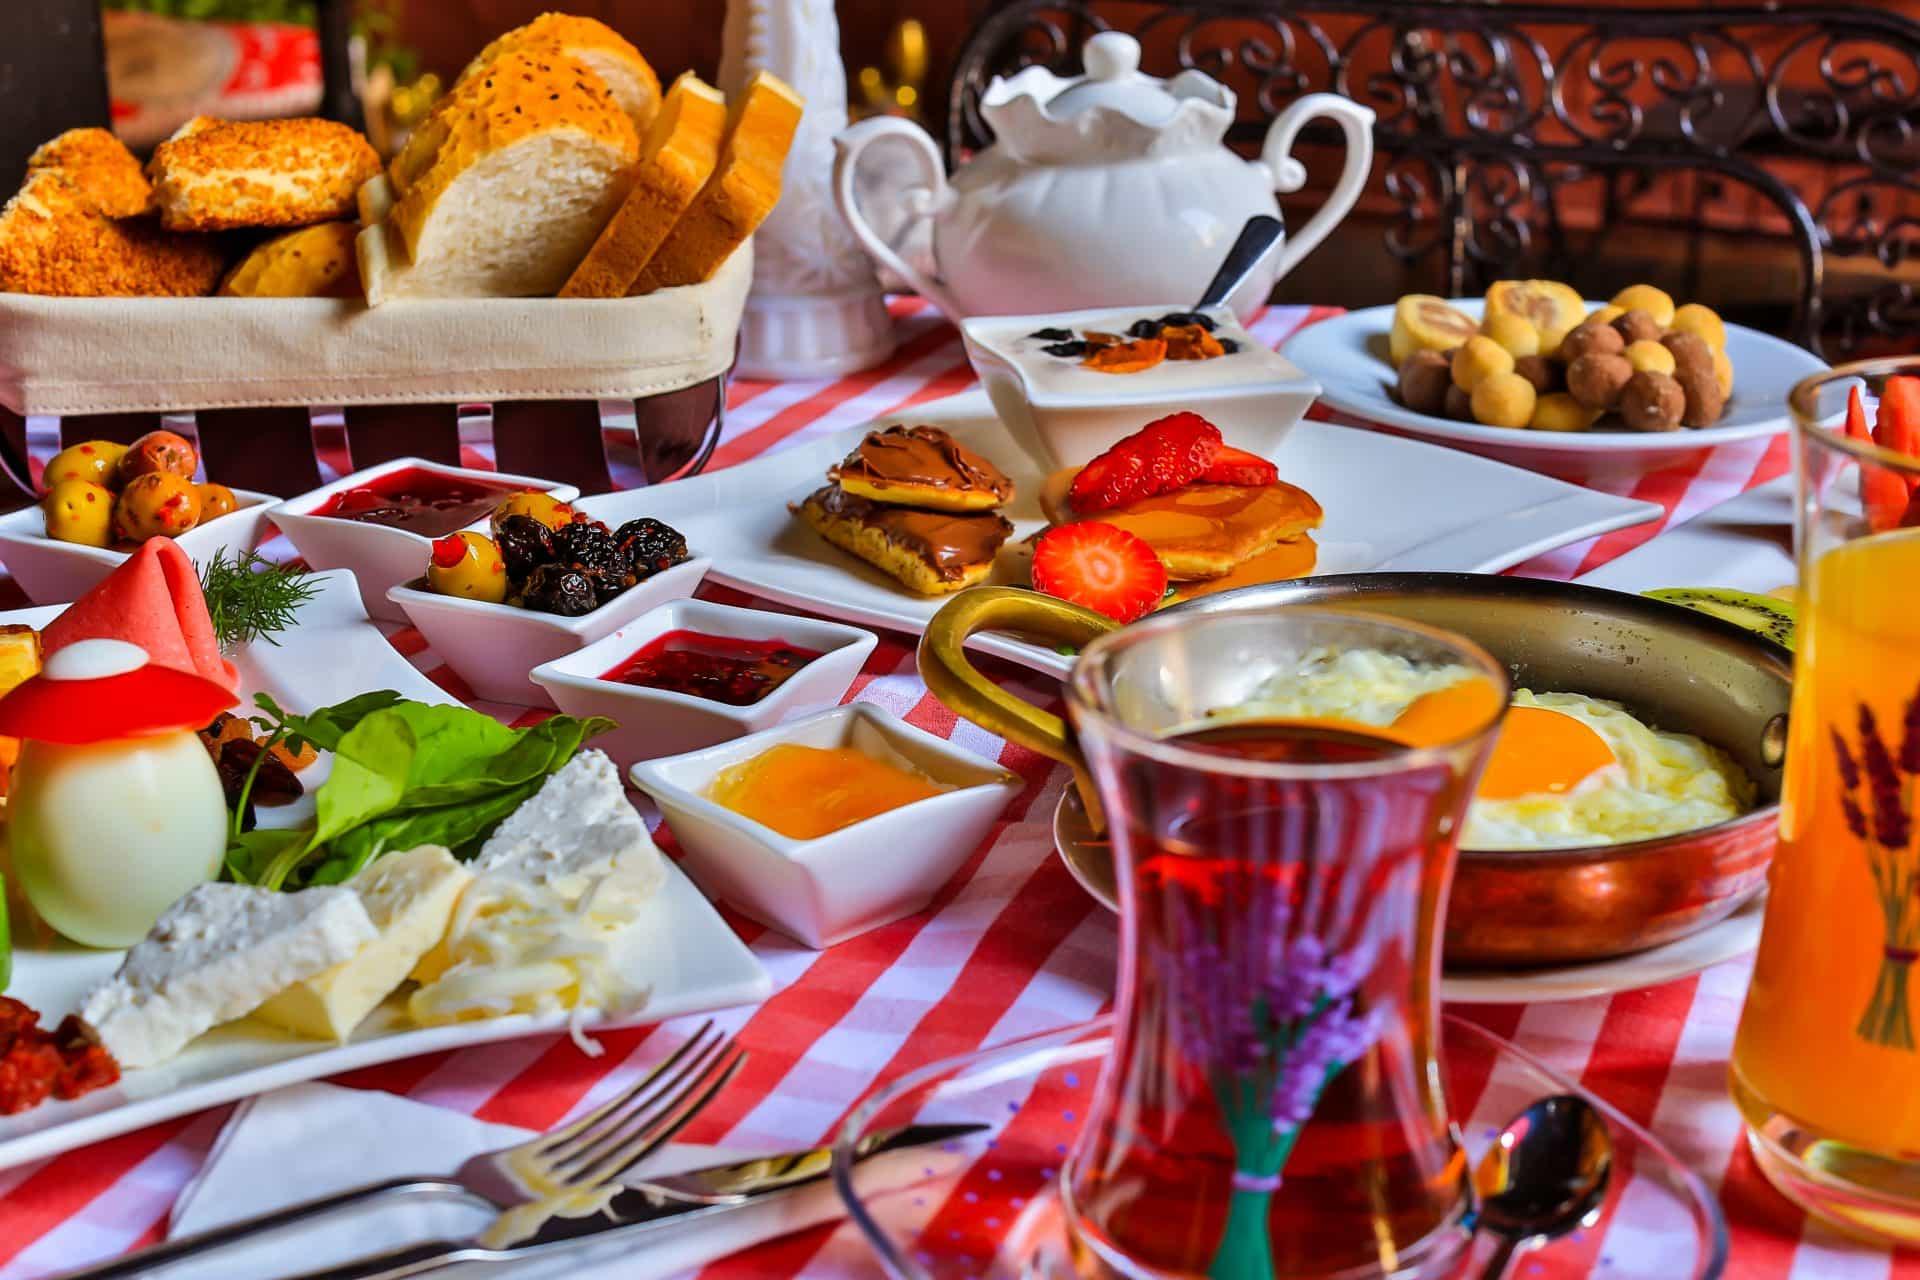 cihangir açık büfe kahvaltı, cihangir organik kahvaltı, cihangir kahvaltı